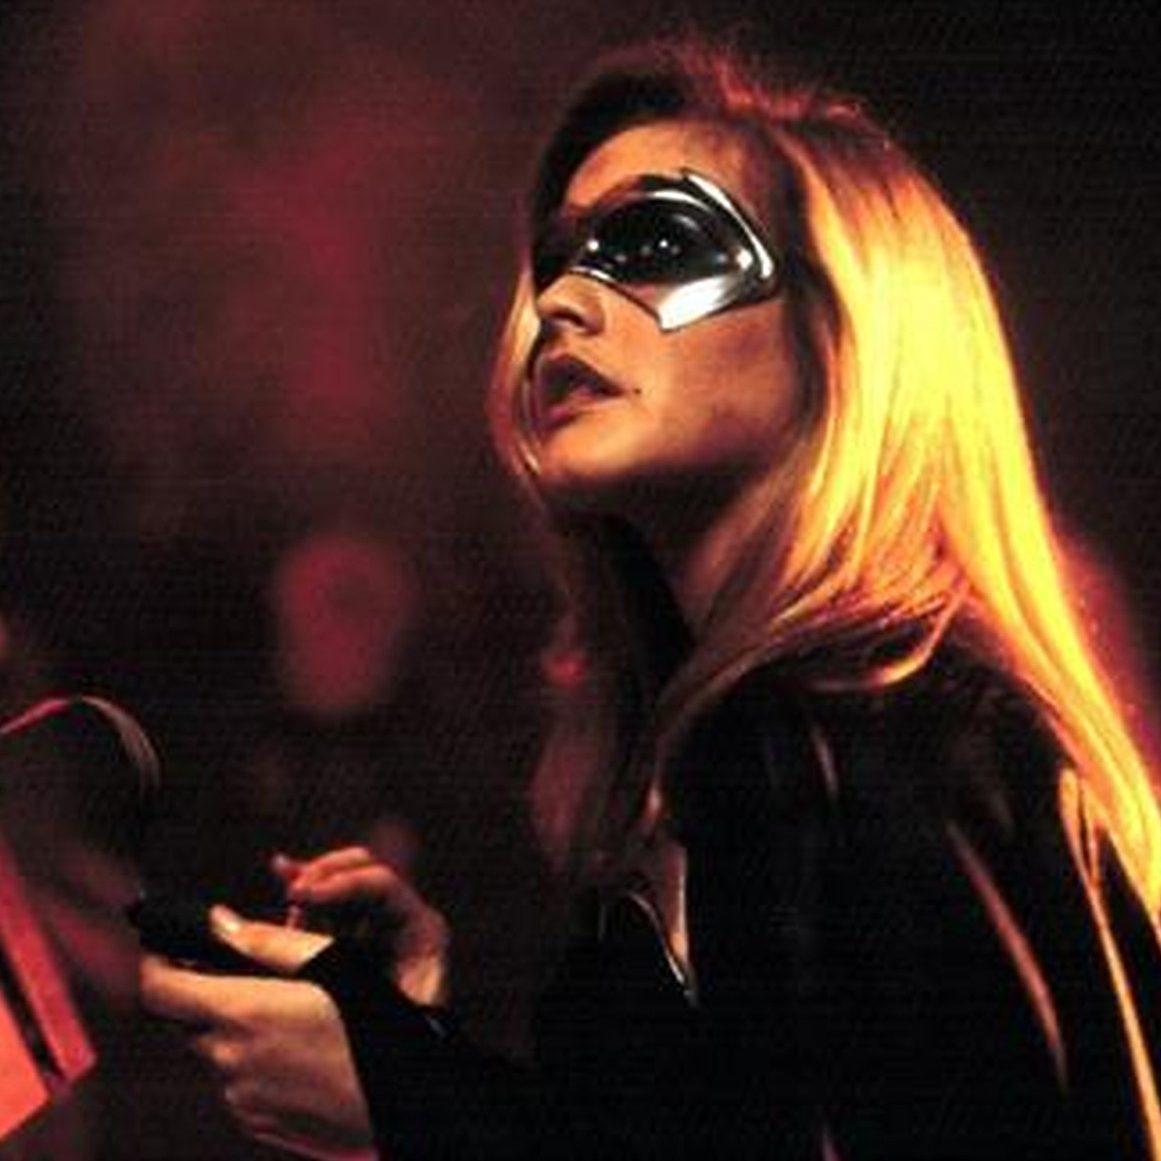 MV5BZWIxZWYzMjItYjYxNi00NGE1LWEwNzQtYjcwYmIwNDQ2NDA5XkEyXkFqcGdeQXVyNjA4NTIyOTE@. V1 e1602752463615 20 Things You Might Not Have Realised About The 1997 Film Batman & Robin